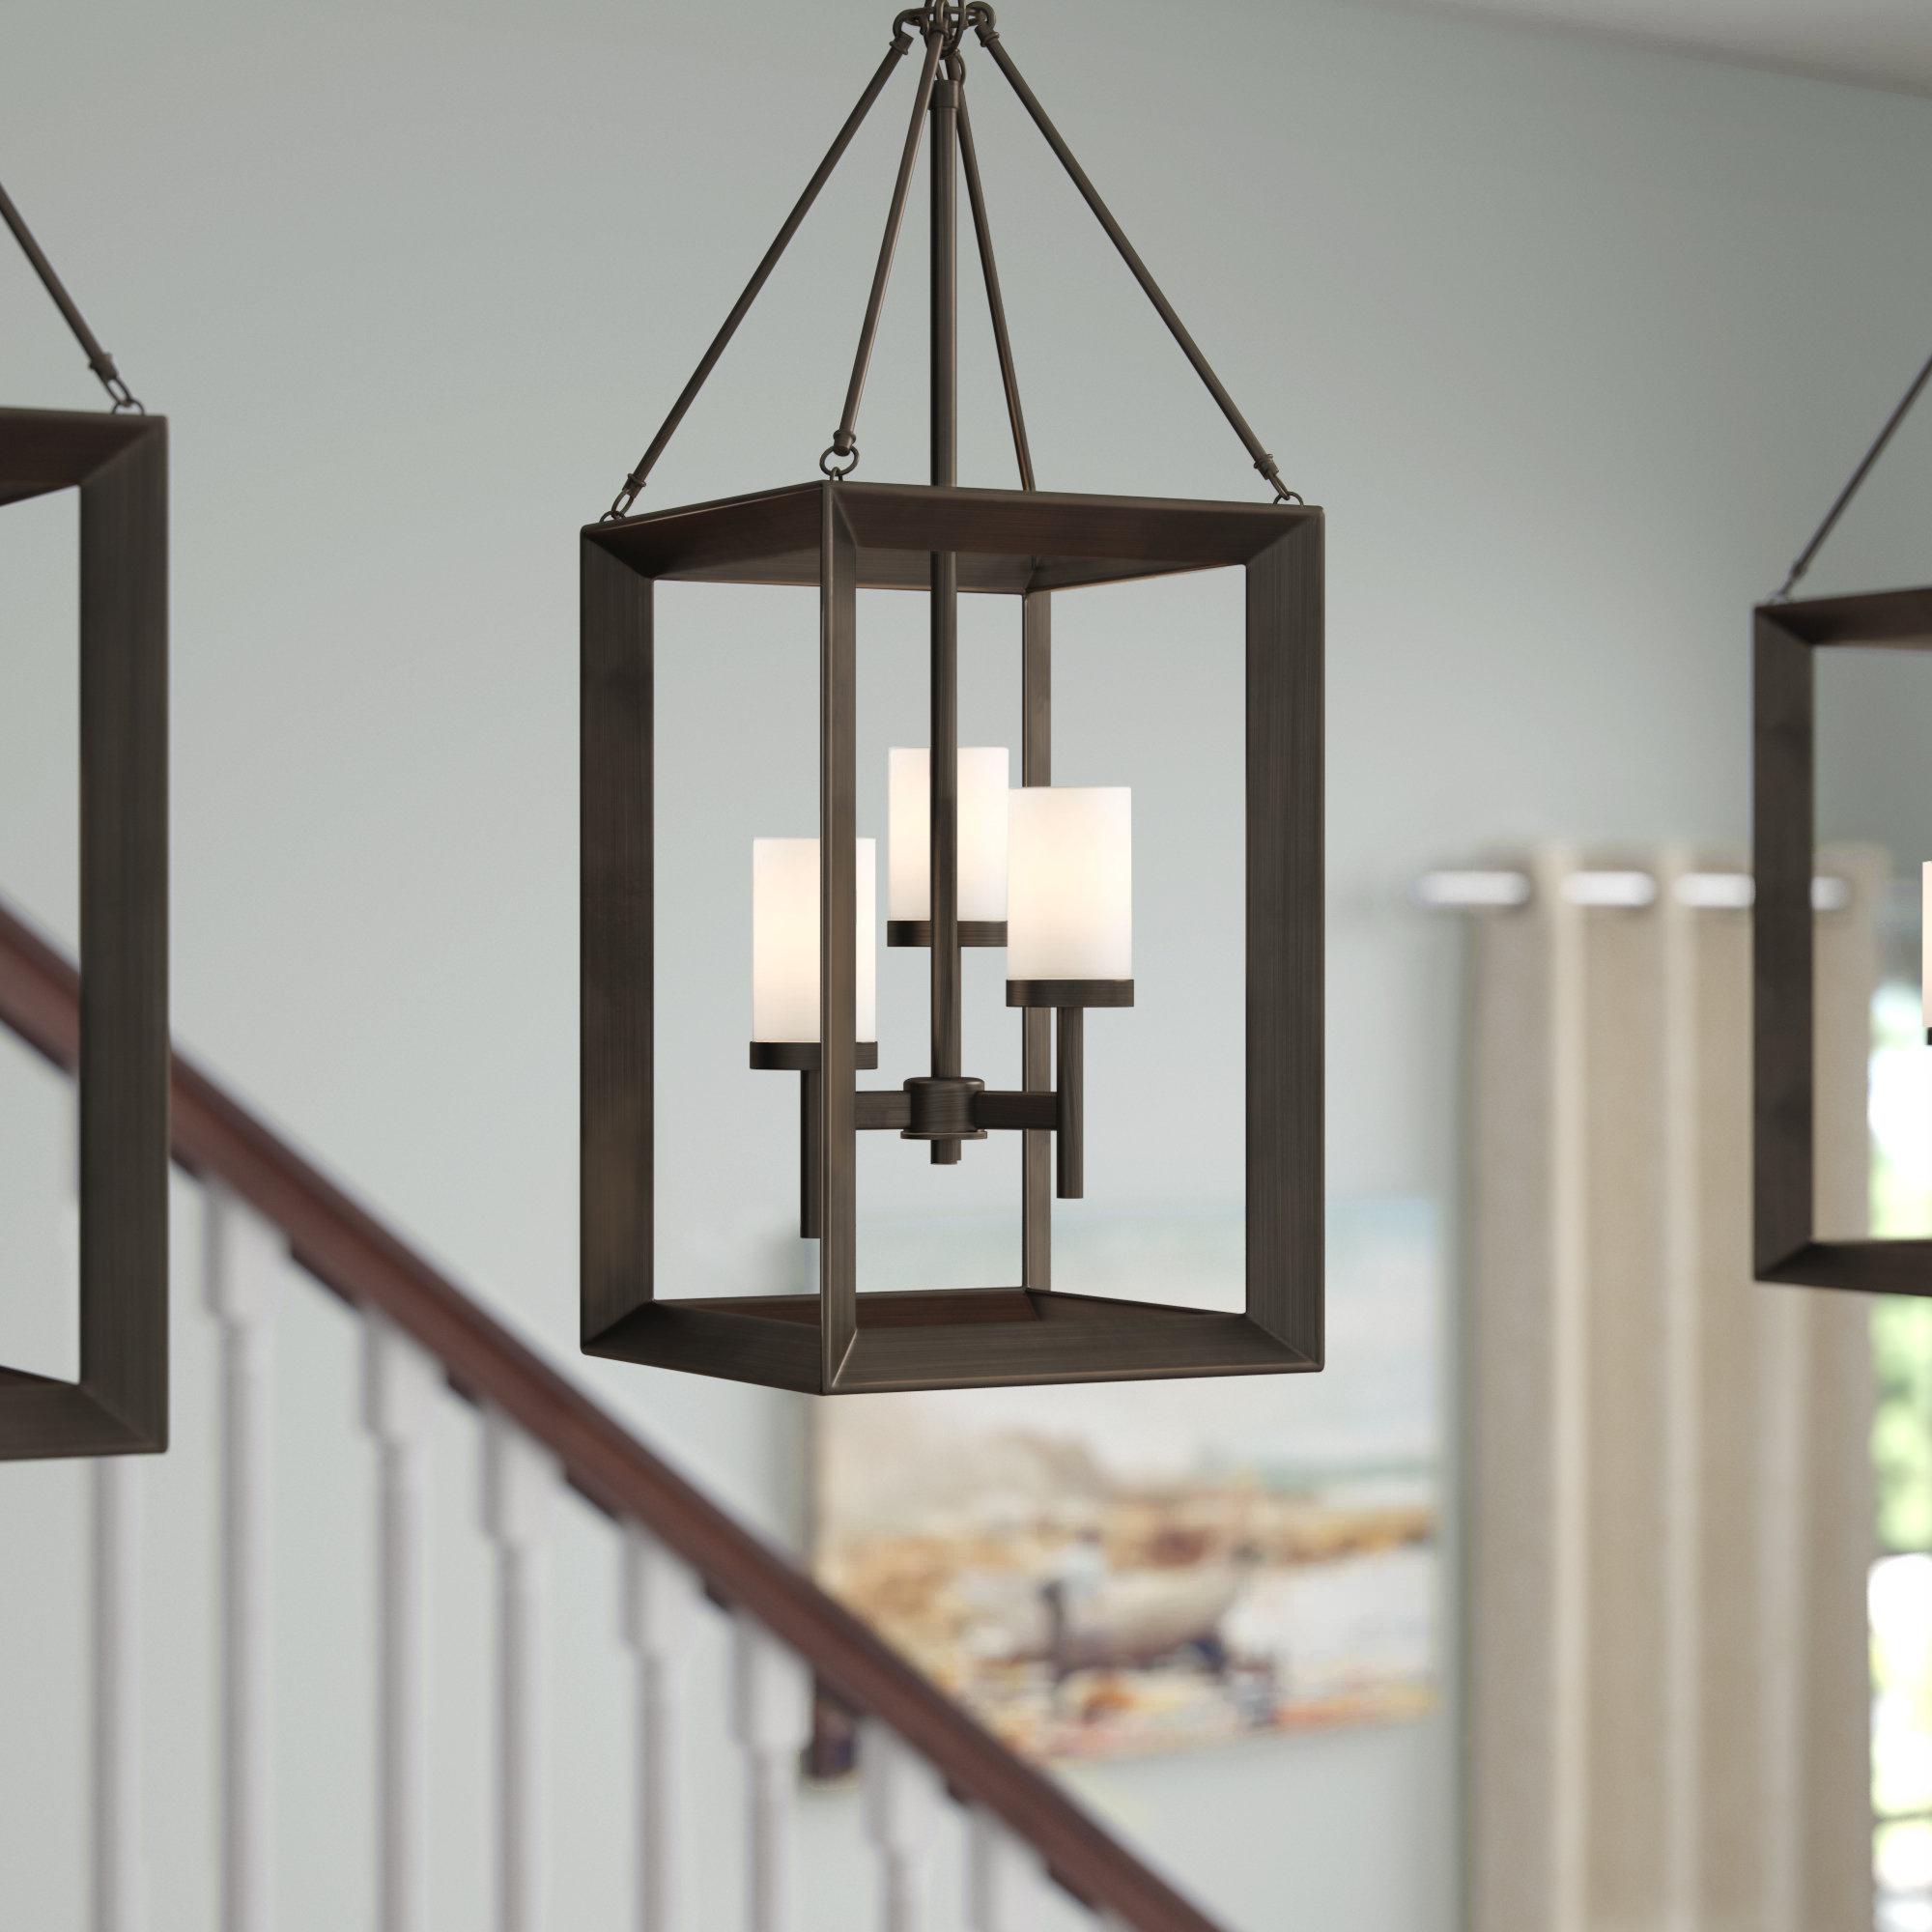 Thorne 3 Light Lantern Square Pendant Pertaining To Best And Newest Thorne 6 Light Lantern Square / Rectangle Pendants (View 7 of 25)